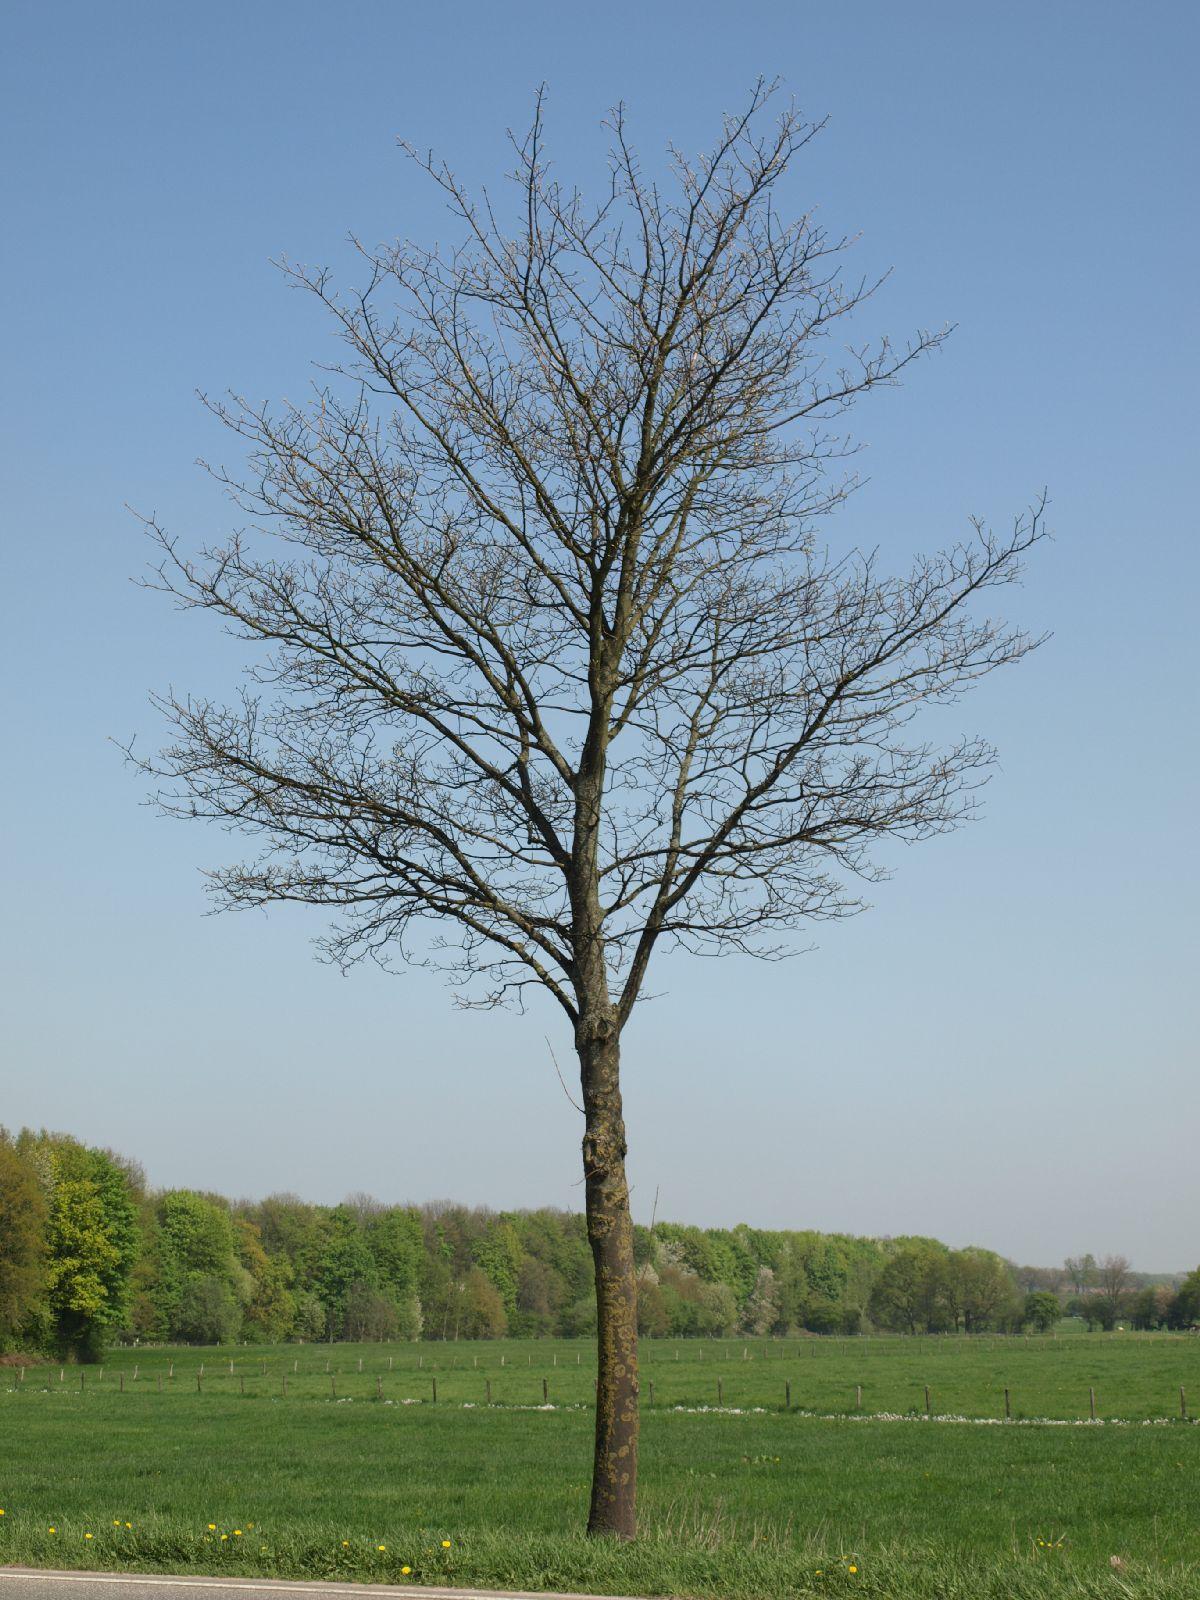 Pflanzen-Baum-Silhouette-Foto_Textur_B_P4212531